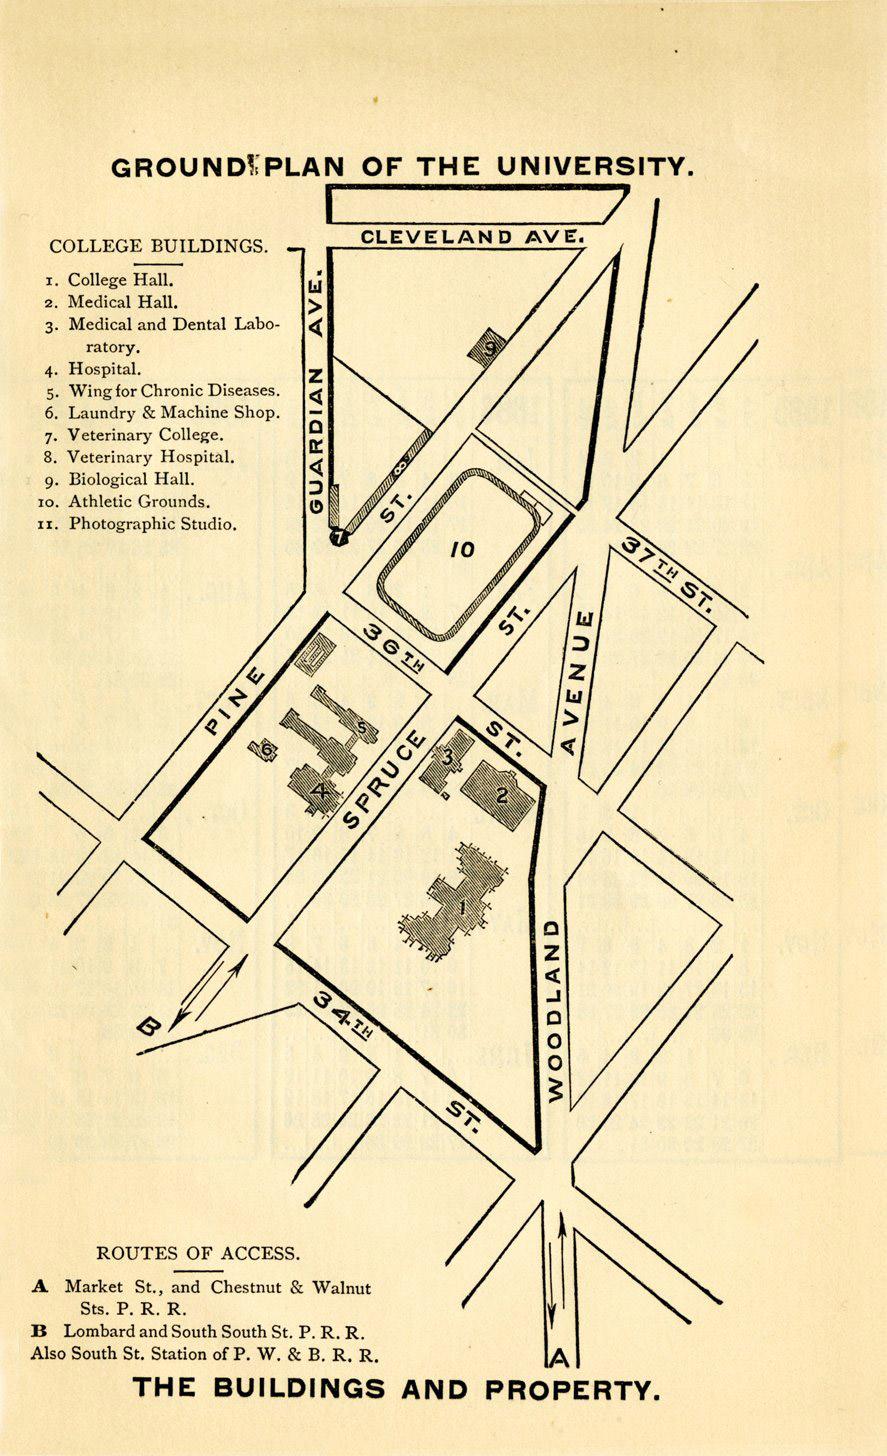 University Of St Thomas Houston Campus Map.Penn Campuses Before 1900 West Philadelphia Campus University